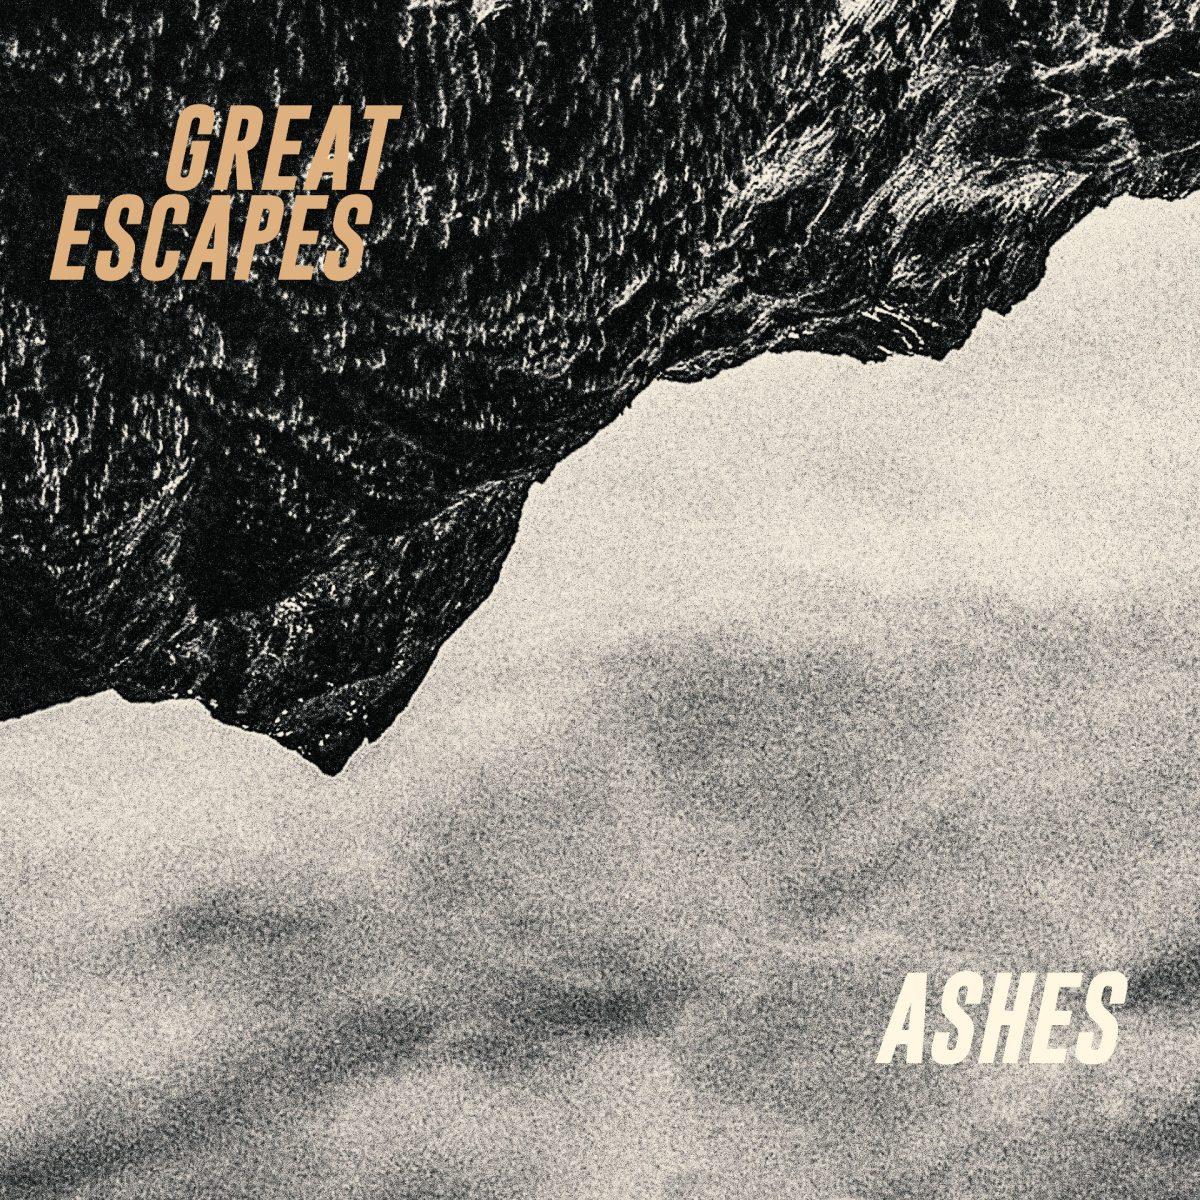 great-escapes-ashes-single-vorstellung-album-ankuendigung